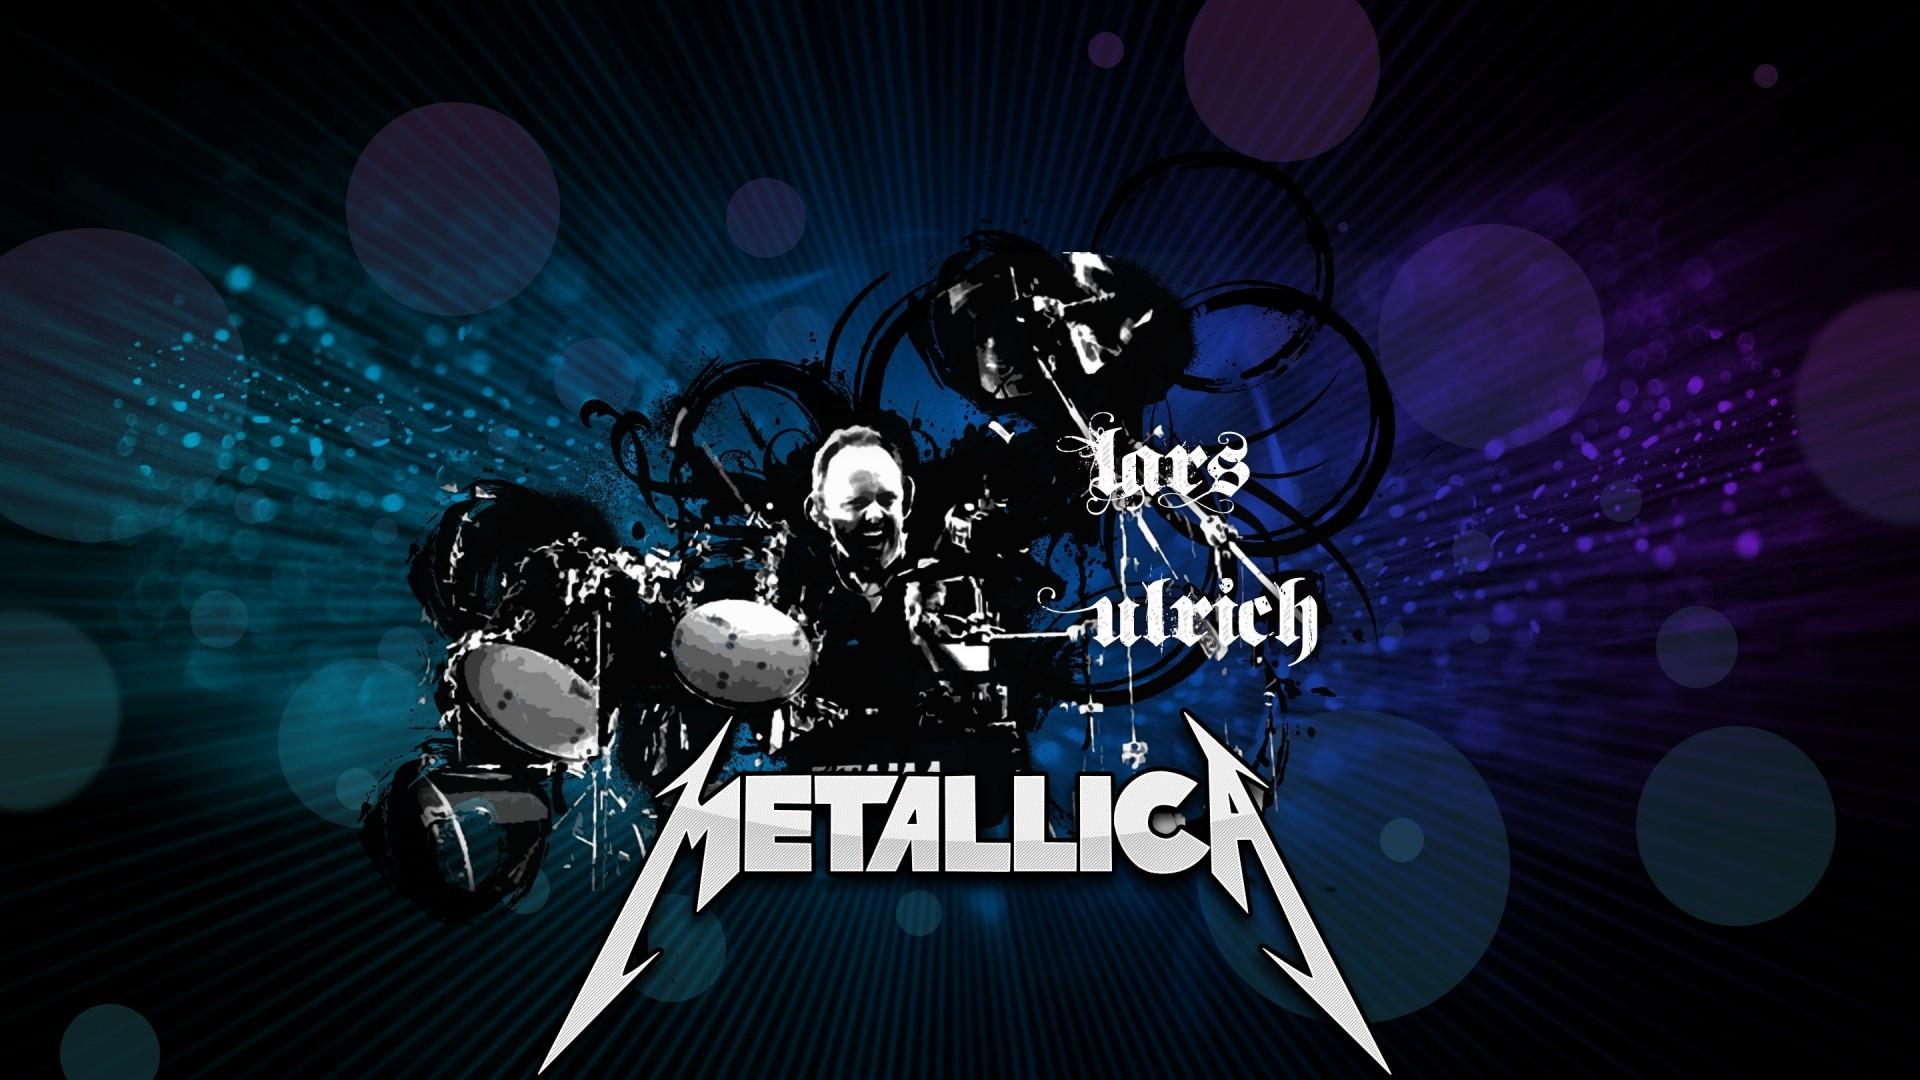 metallica, drum, name